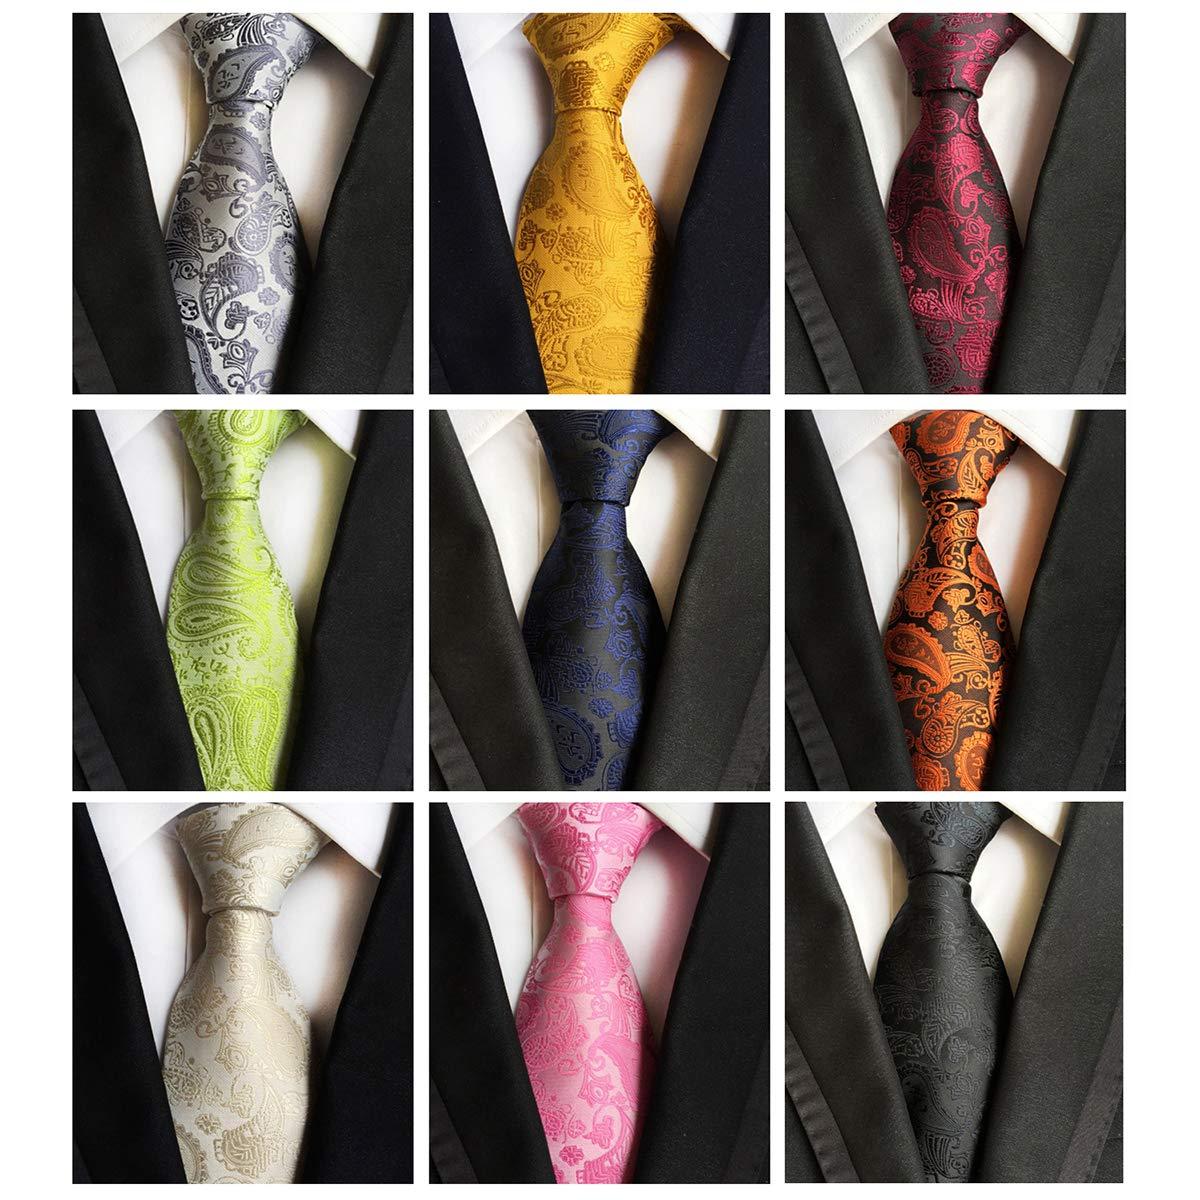 Jeatonge Lot 6pcs Mens Ties and 3pcs Tie Clips, Men's Classic Tie Necktie Woven Jacquard Neck Ties (9-11)